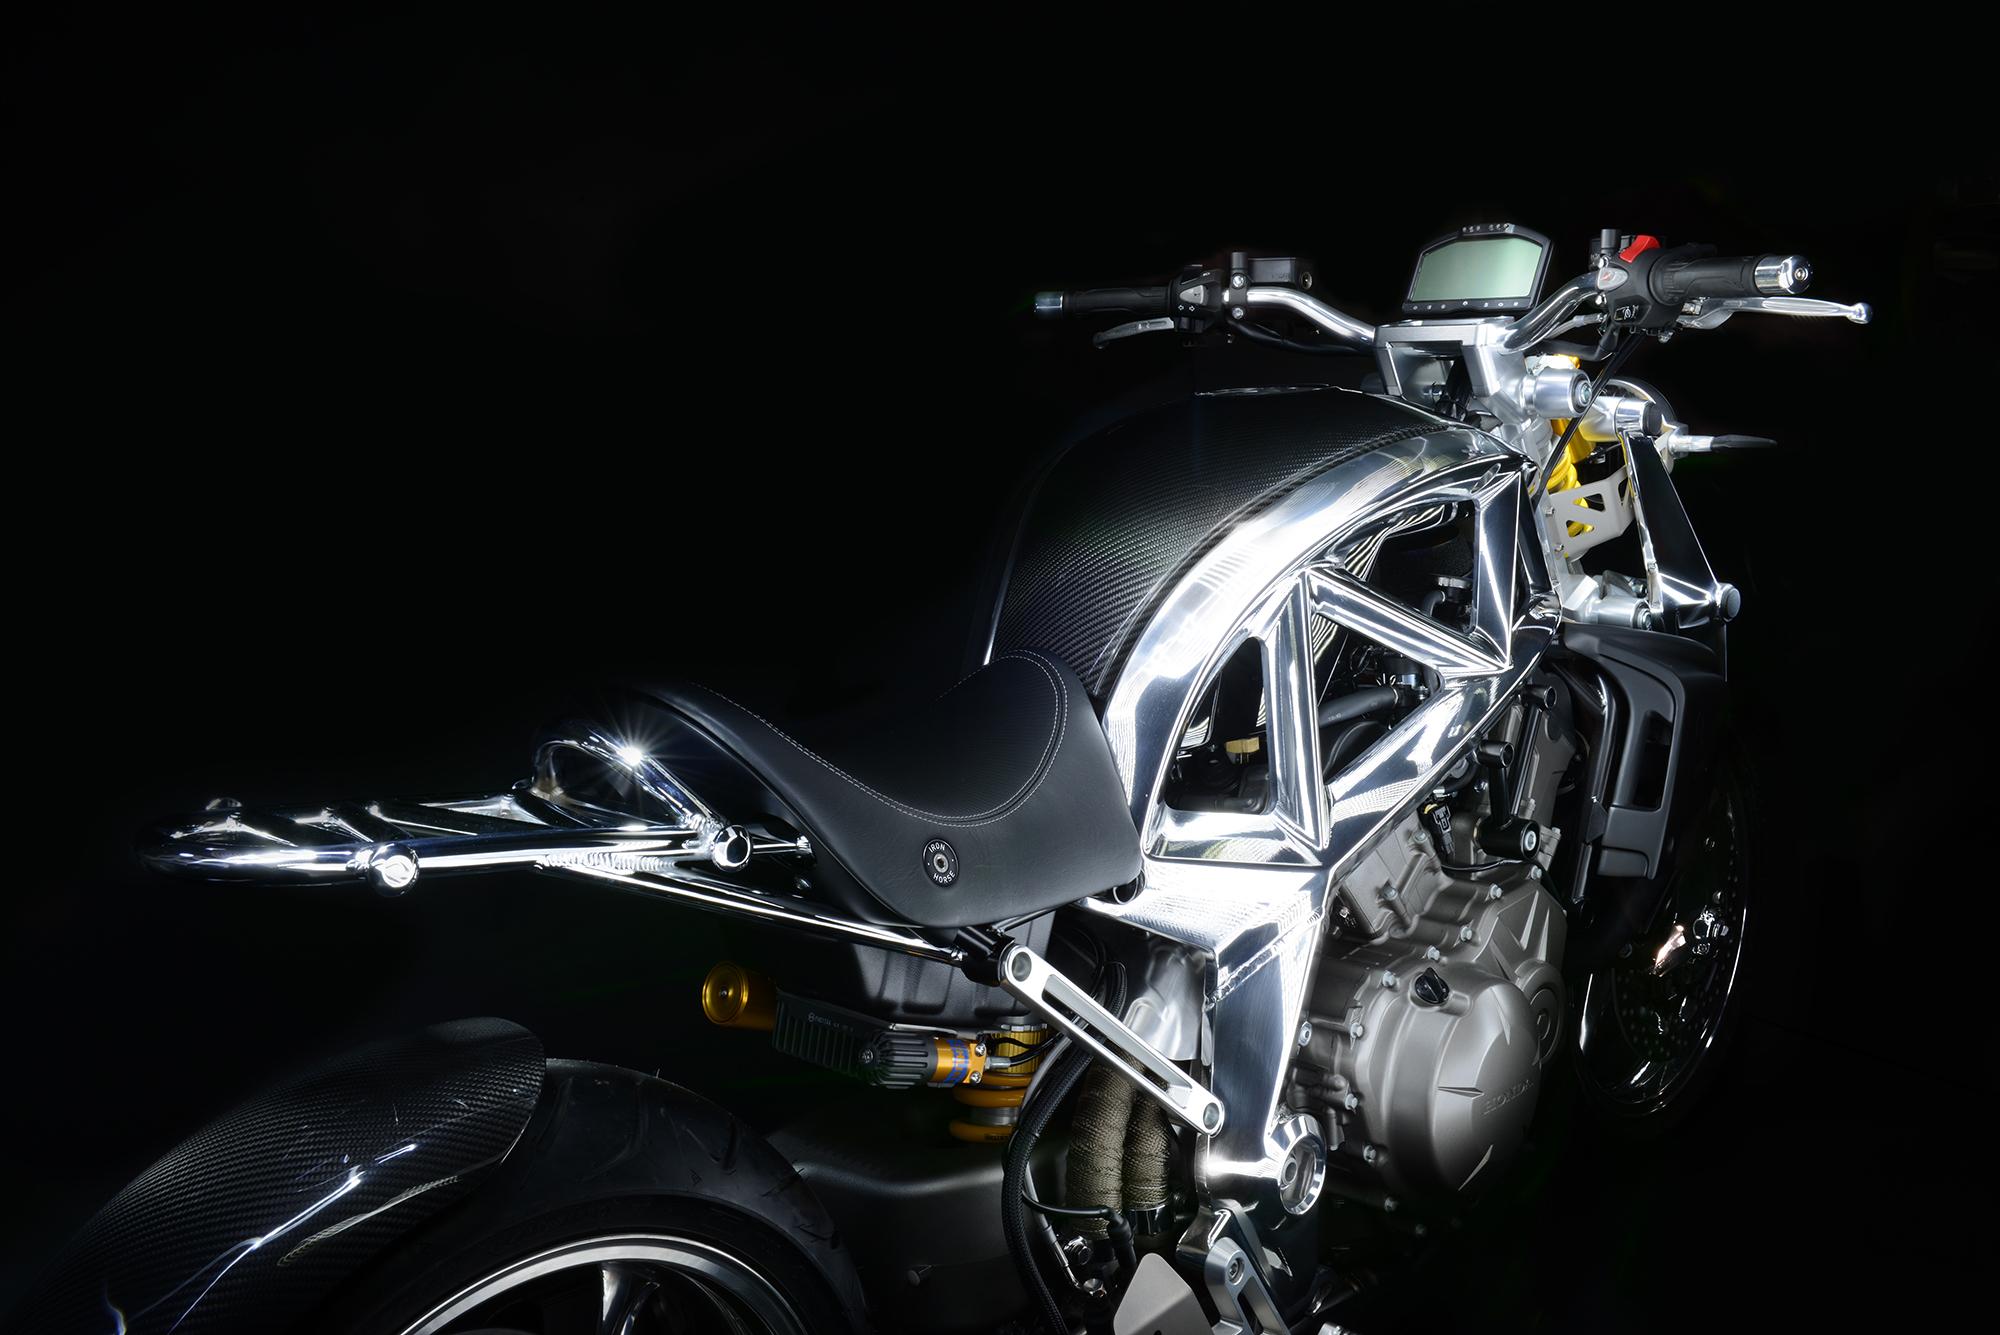 Iron Horse R34